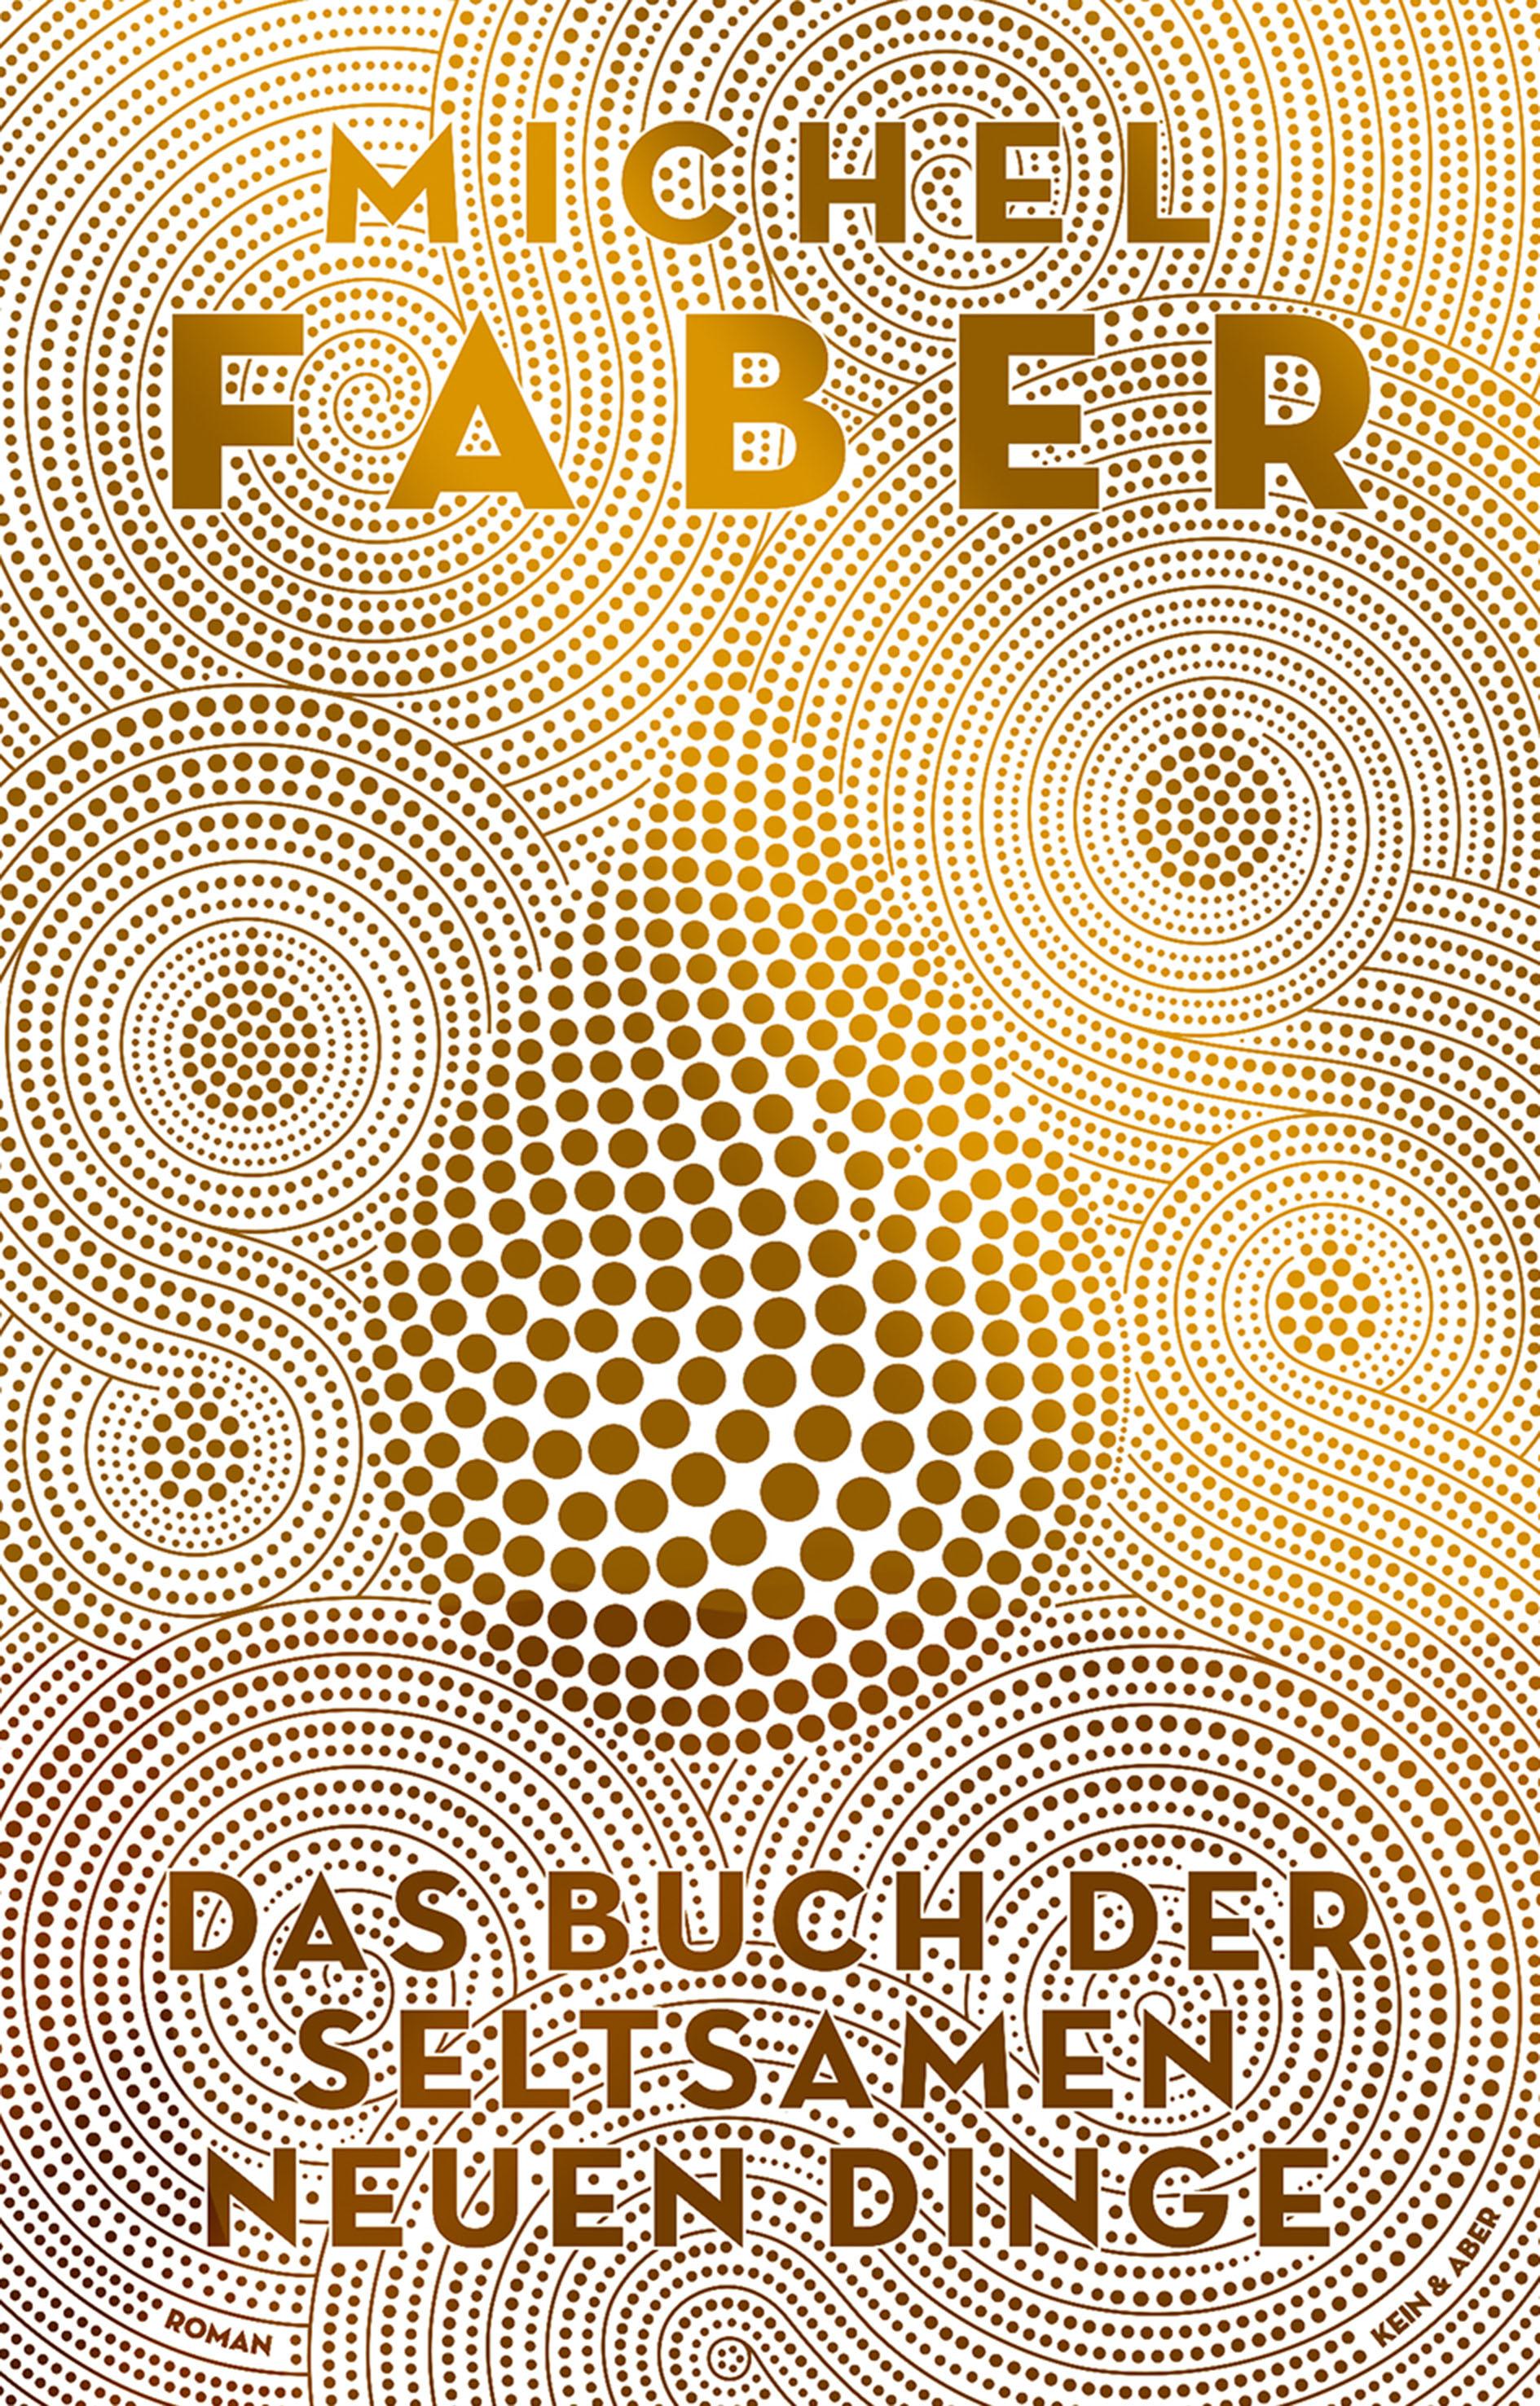 Michel Faber ~ Das Buch der seltsamen neuen Dinge 9783036957791